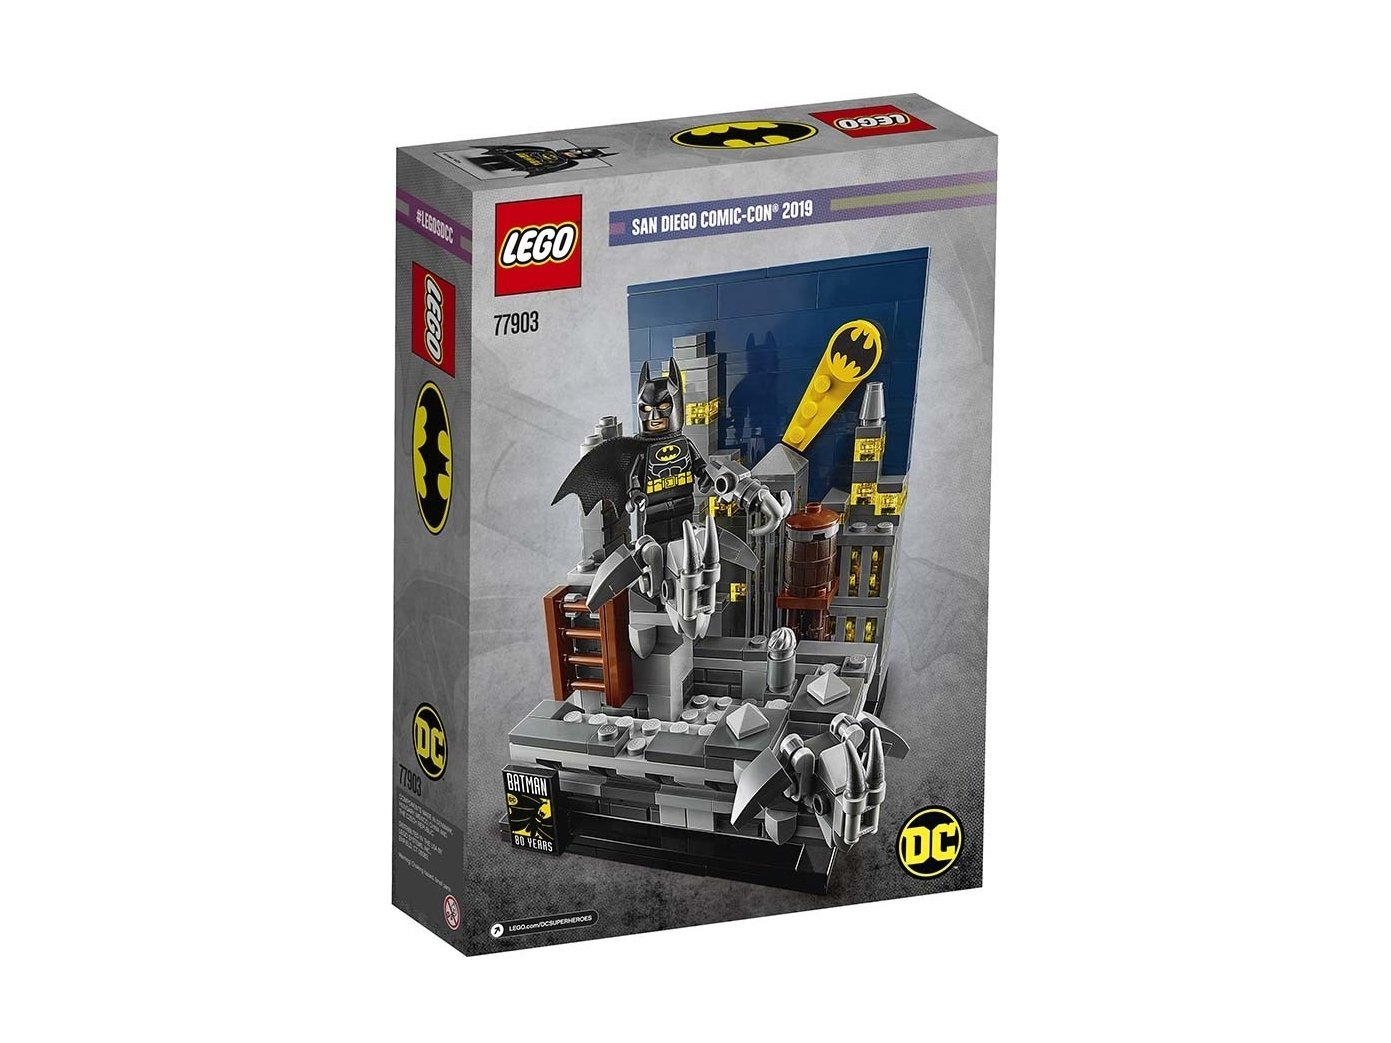 LEGO 77903 DC Comics™ Super Heroes The Dark Knight of Gotham City™